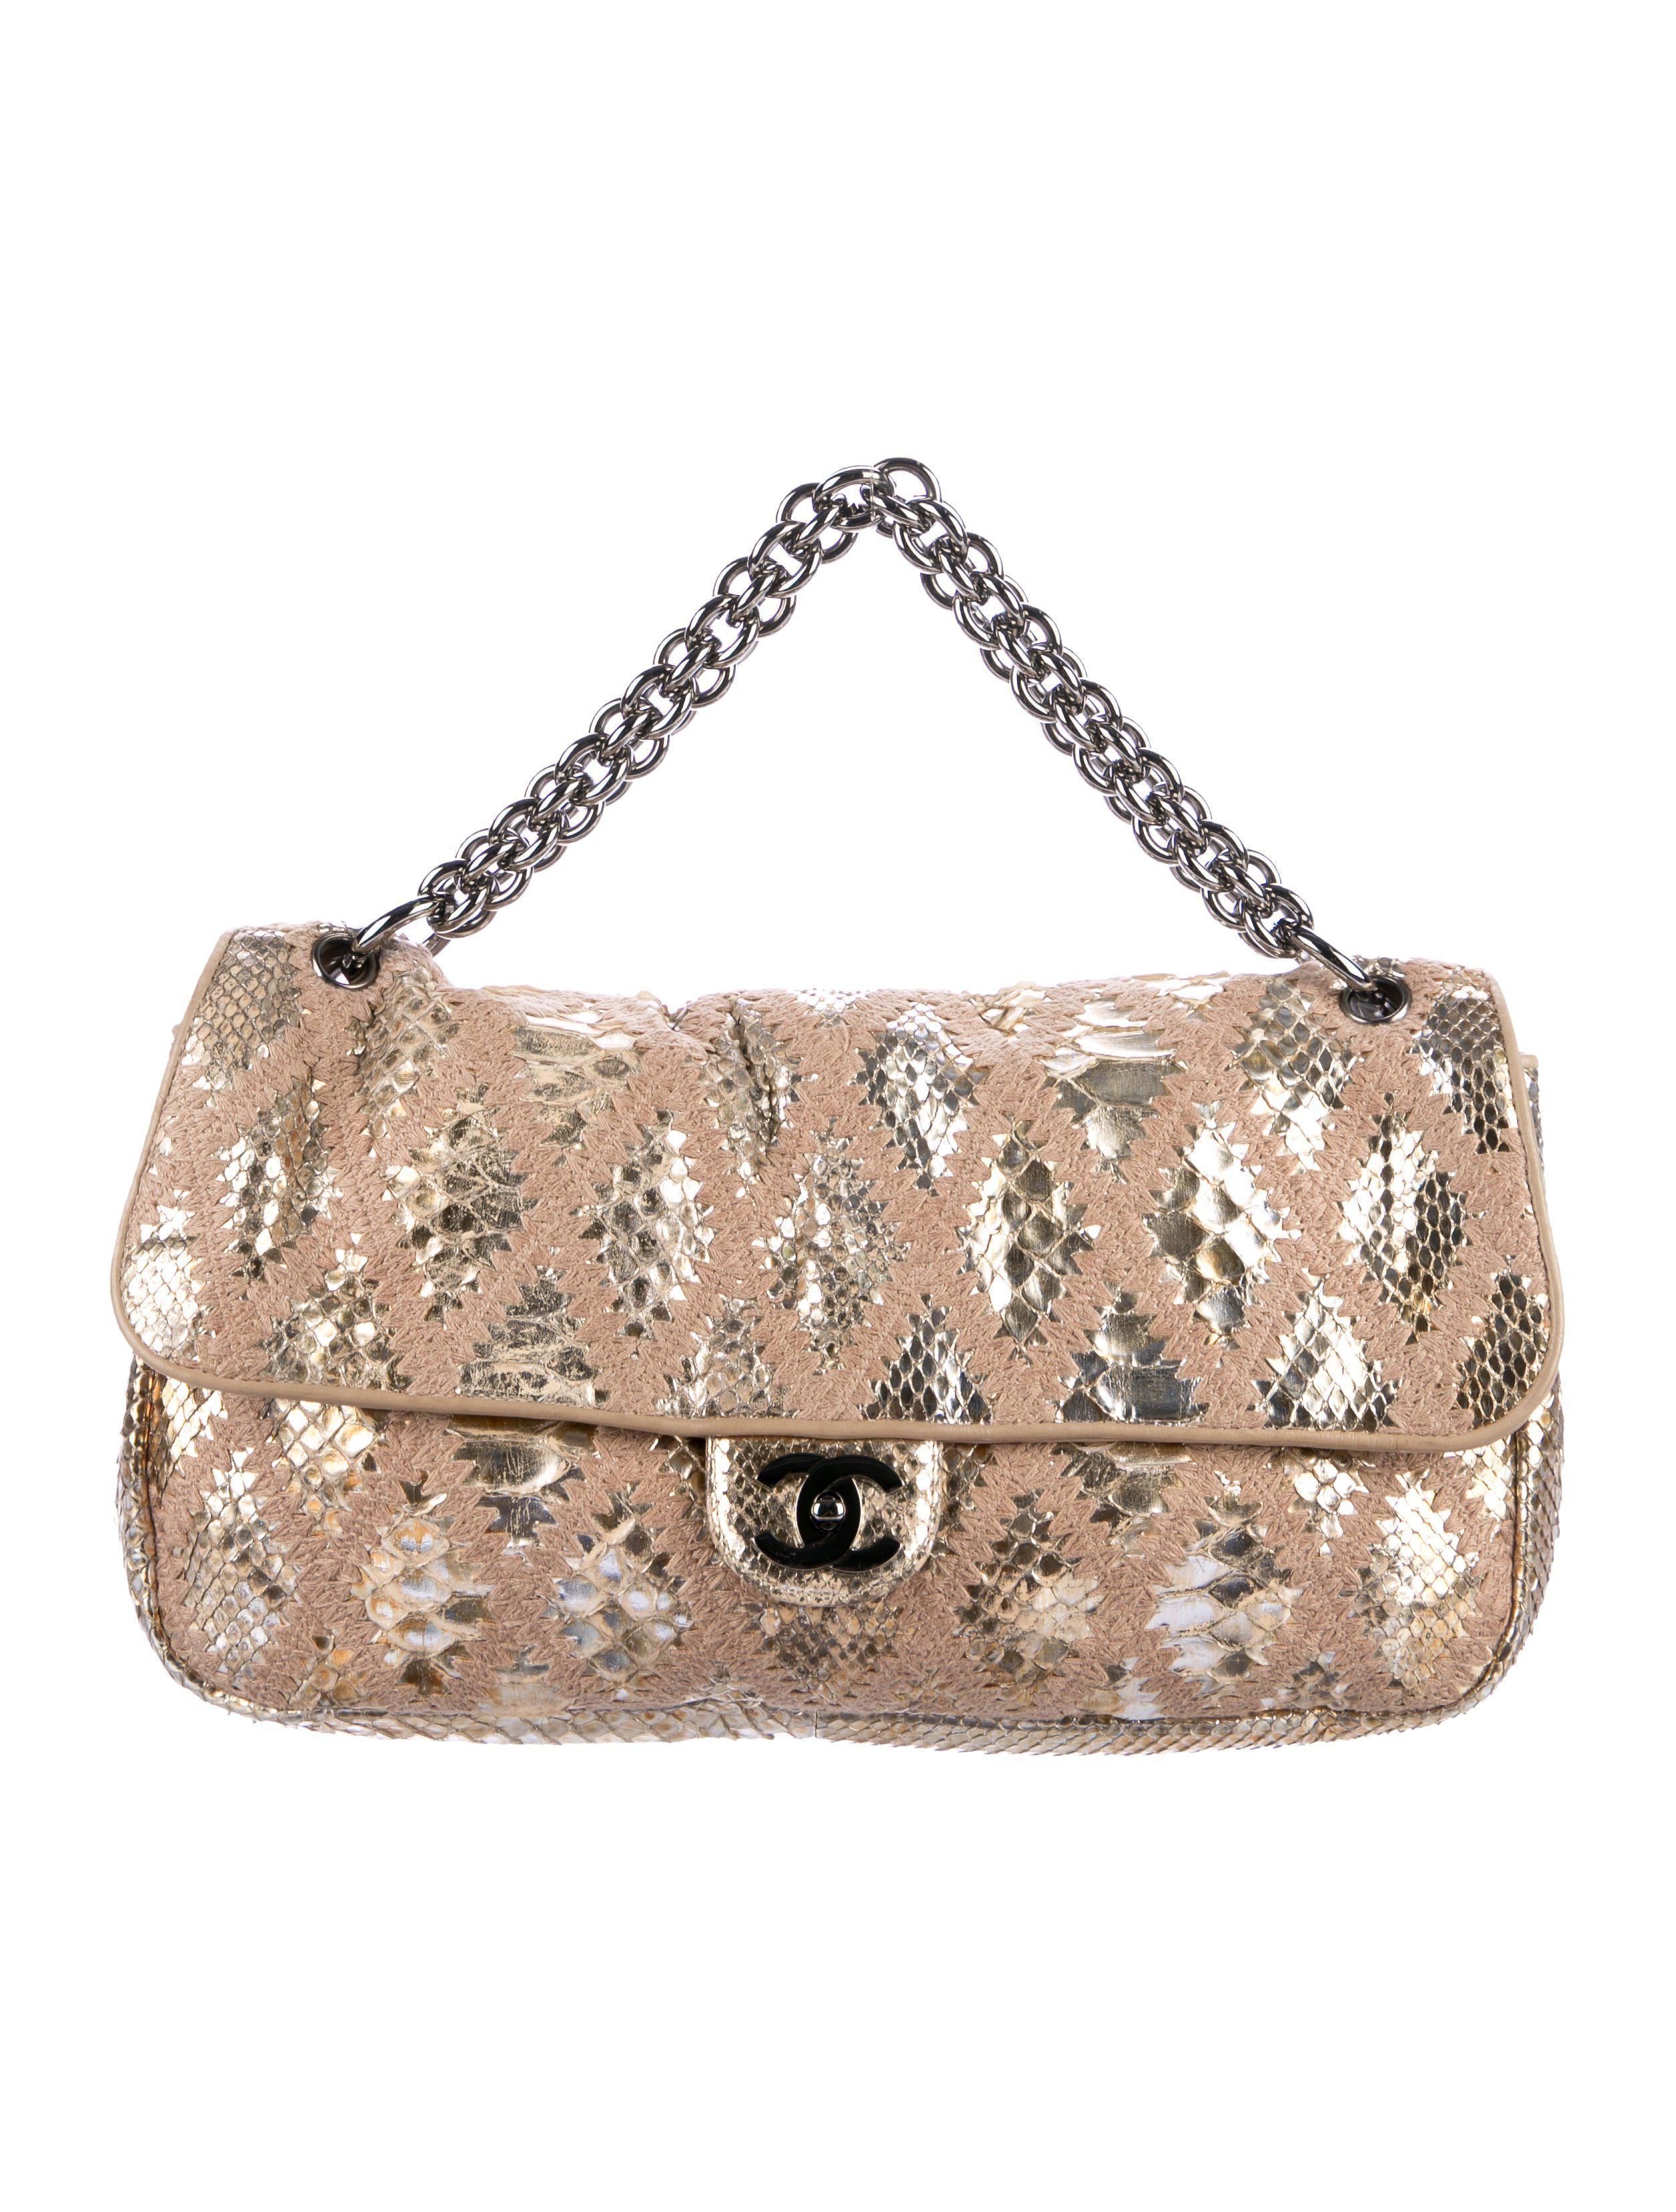 2c0c5a525a77 Lyst - Chanel Soft   Chain Python Crochet Flap Bag Tan in Natural